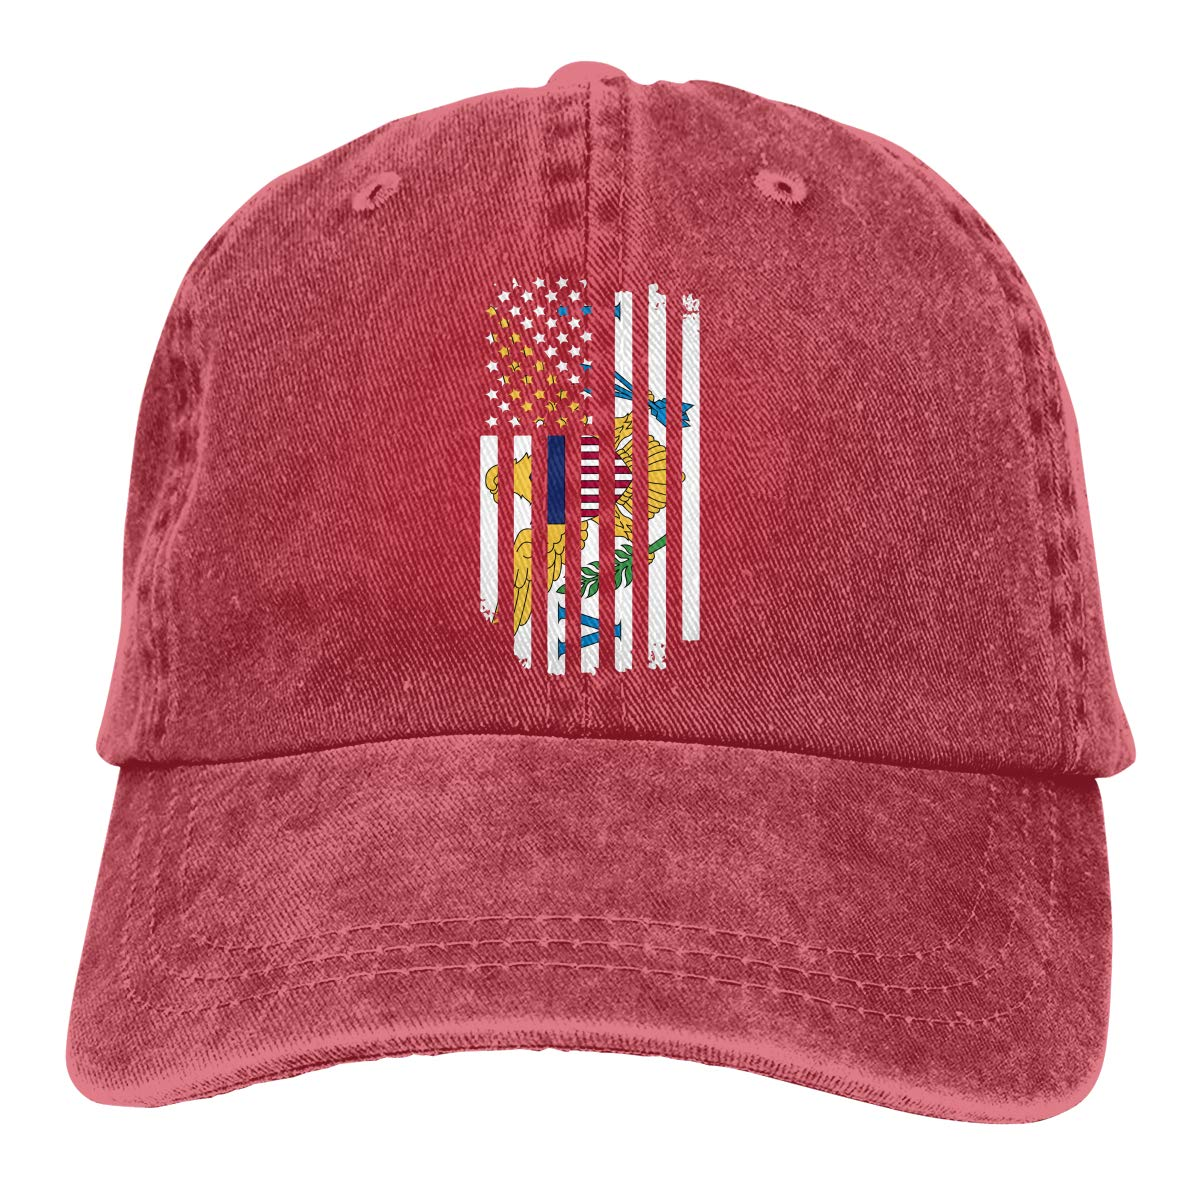 US Virgin Islands Flag3 Adult Custom Denim Casquette Adjustable Baseball Cap